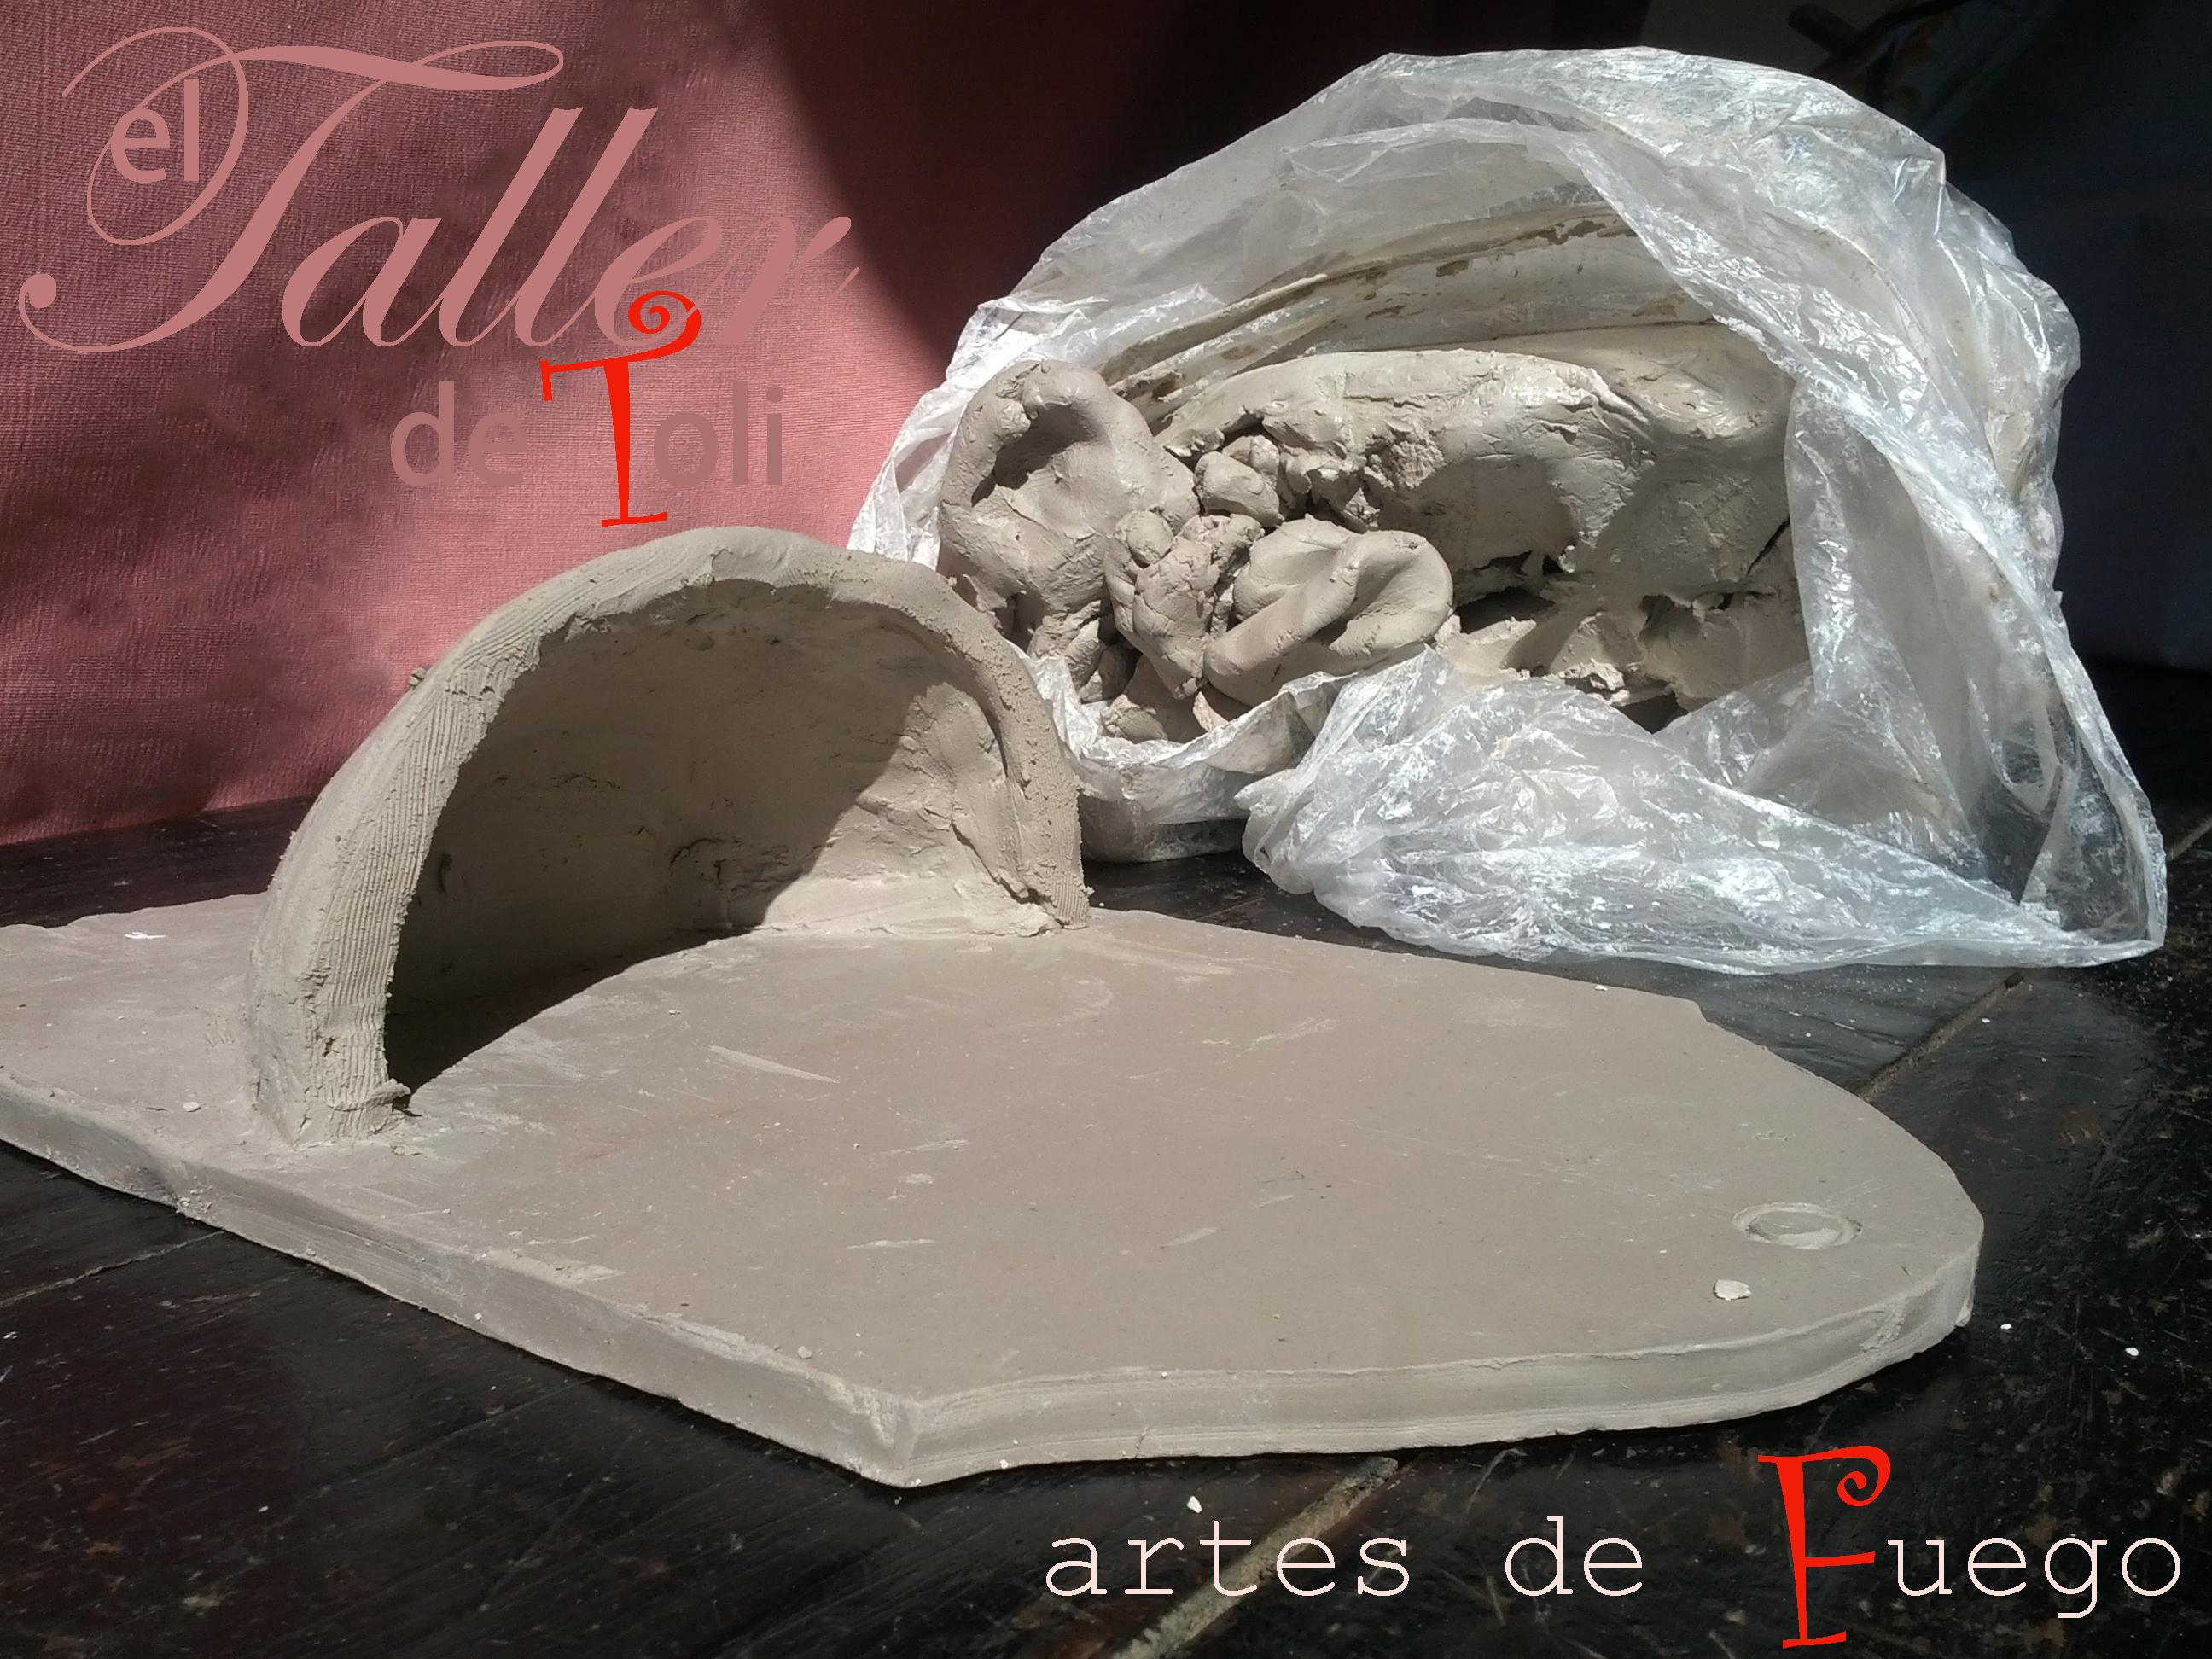 De esta agua has de beber el taller de toli for Arcilla para ceramica